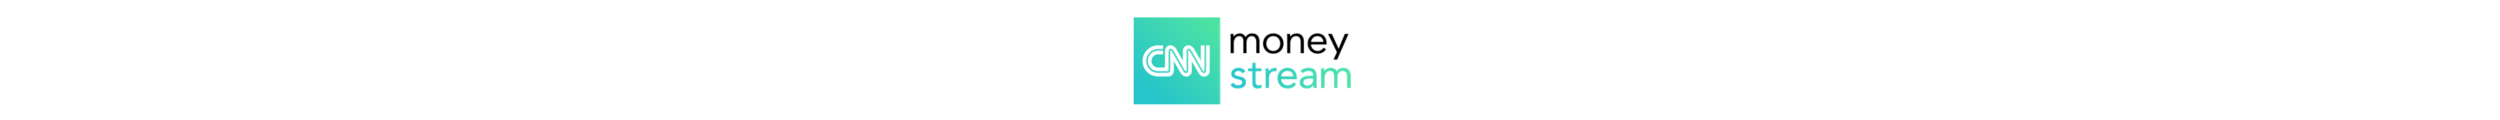 moneystream logo banner.png